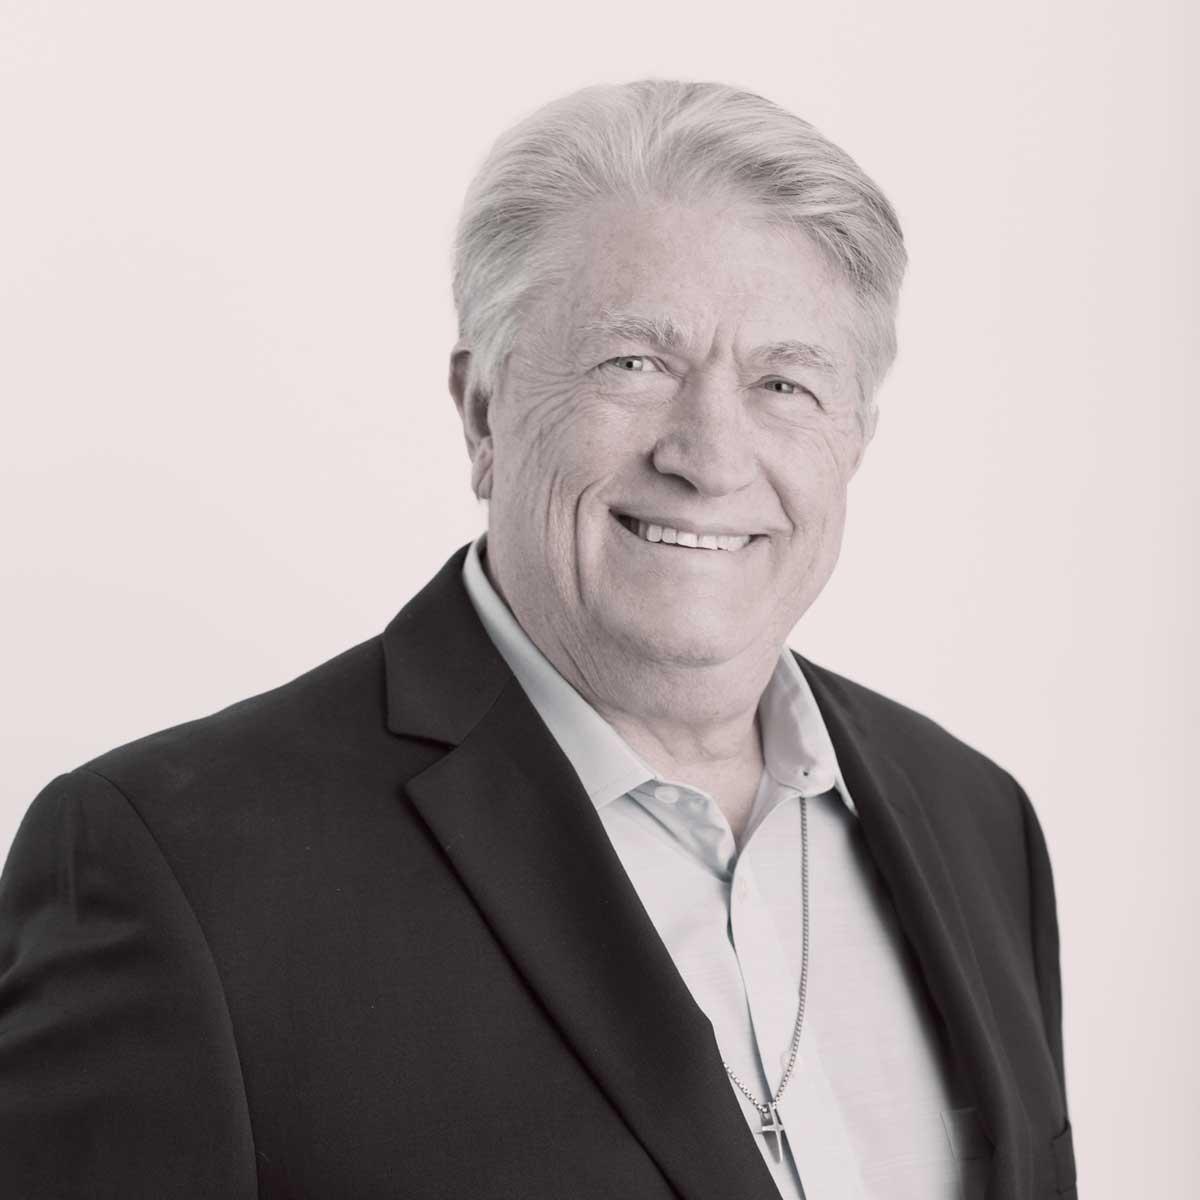 Peter K. Gallaher